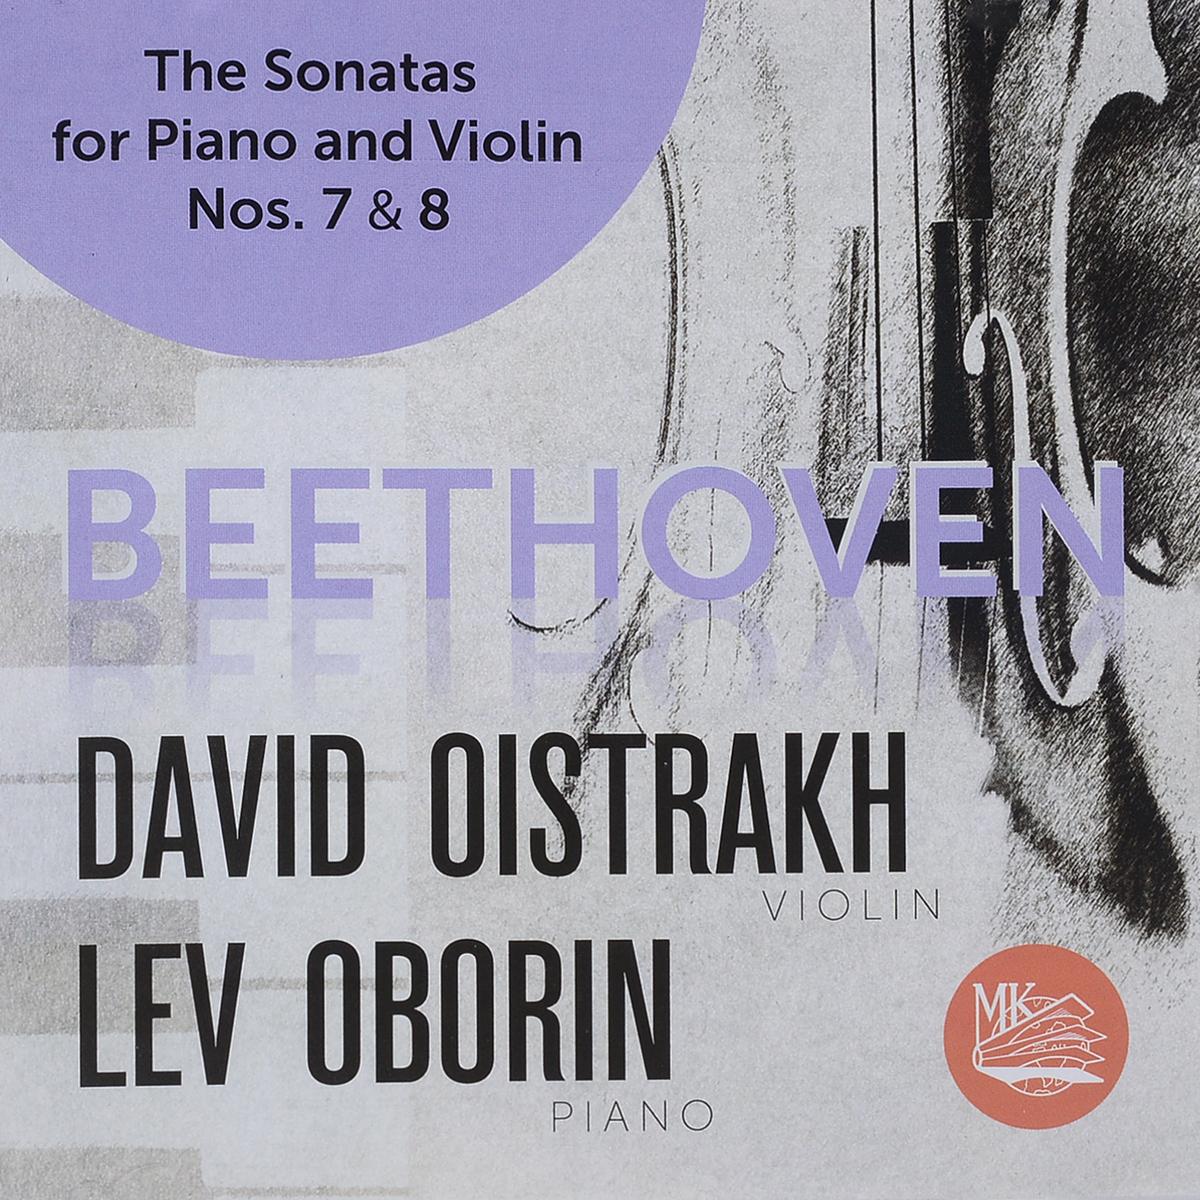 цена на Давид Ойстрах,Лев Оборин David Oistrakh. Lev Oborin. Beethoven. The Sonatas For Piano And Violin No. 7 & 8